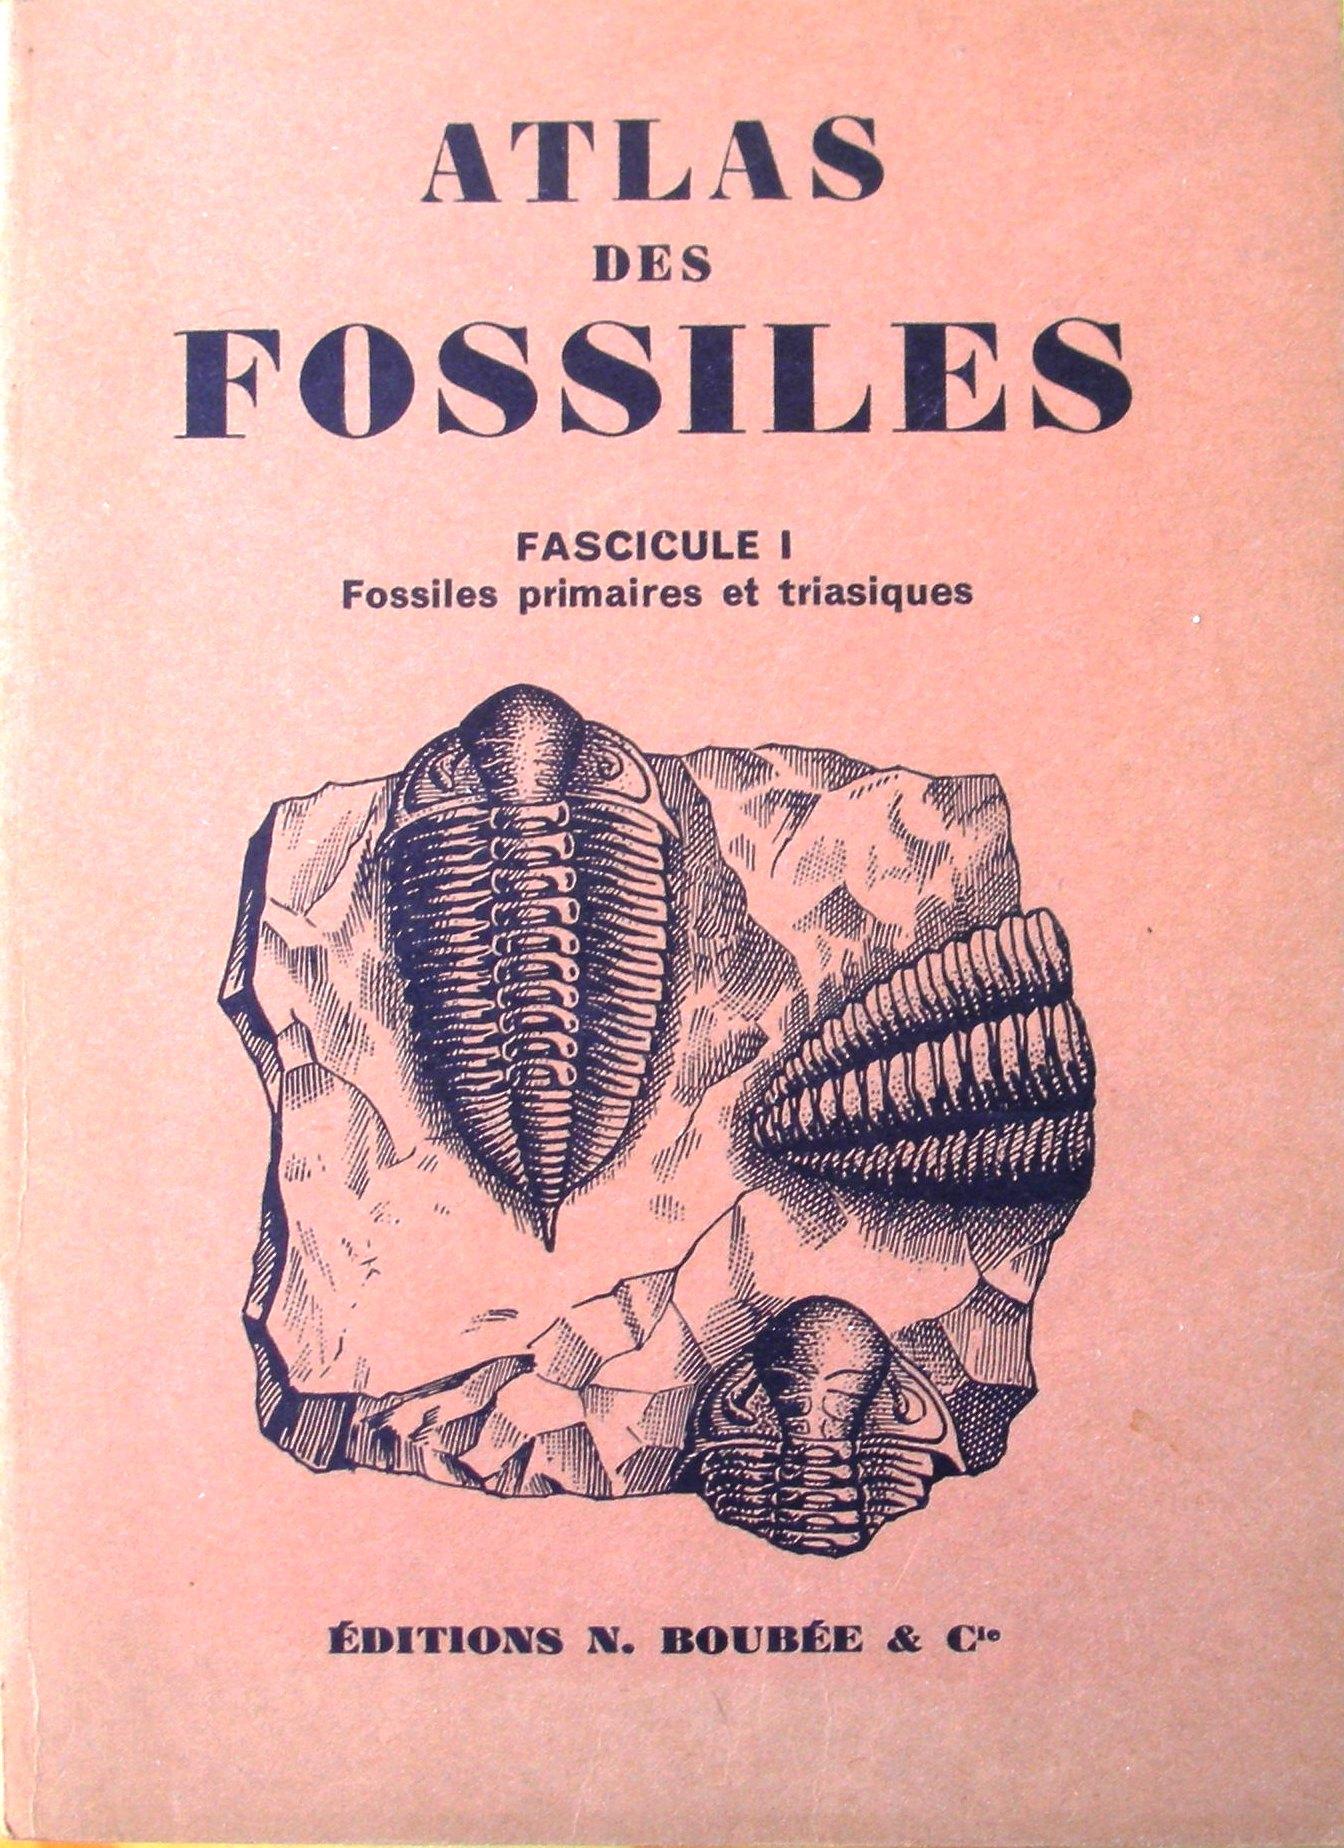 Atlas des fossiles, Fascicule I